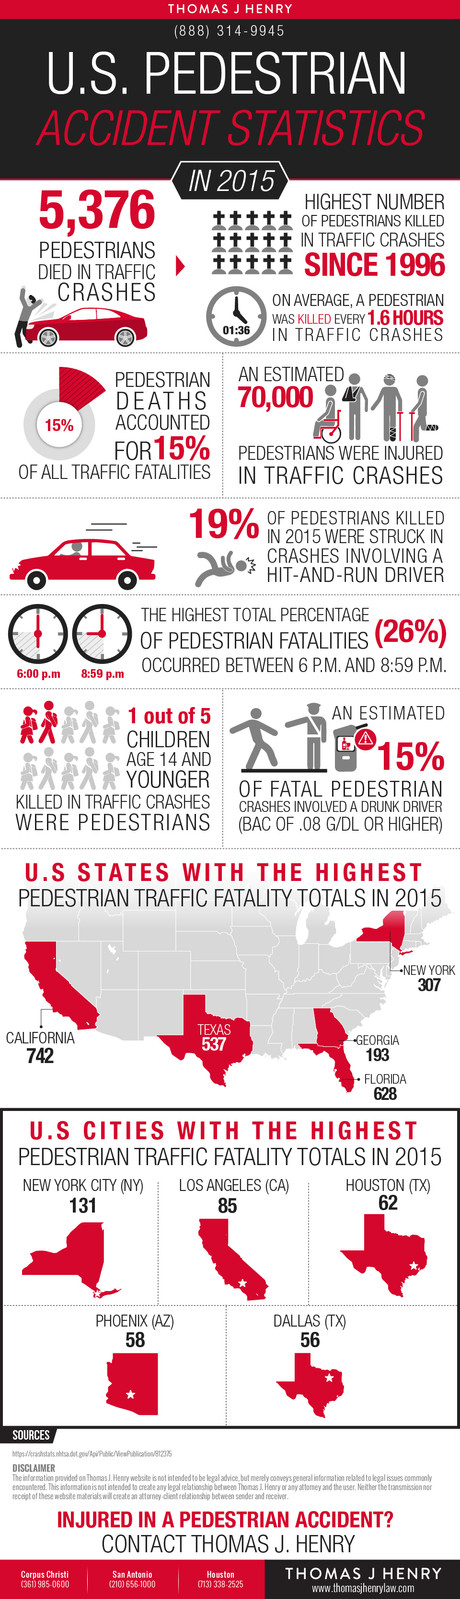 U.S. Pedestrian Accident Statistics